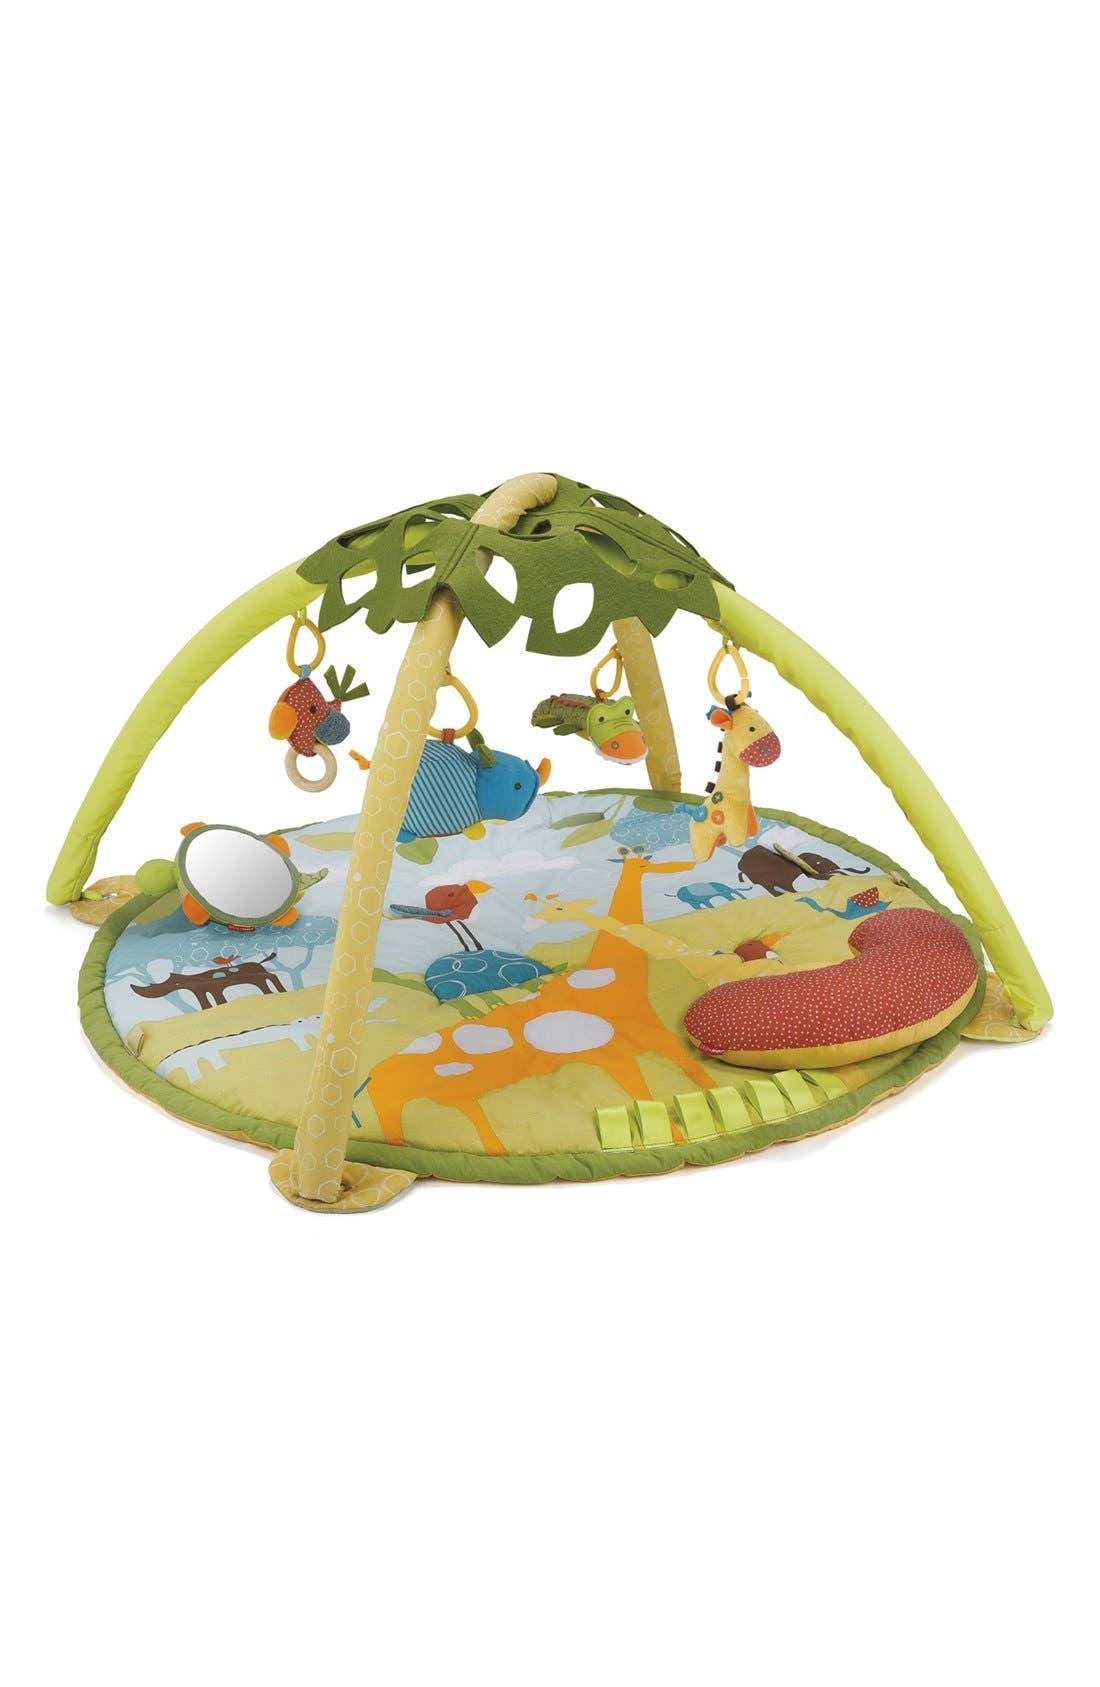 Alternate Image 1 Selected - Skip Hop 'Giraffe Safari' Activity Gym (Baby)